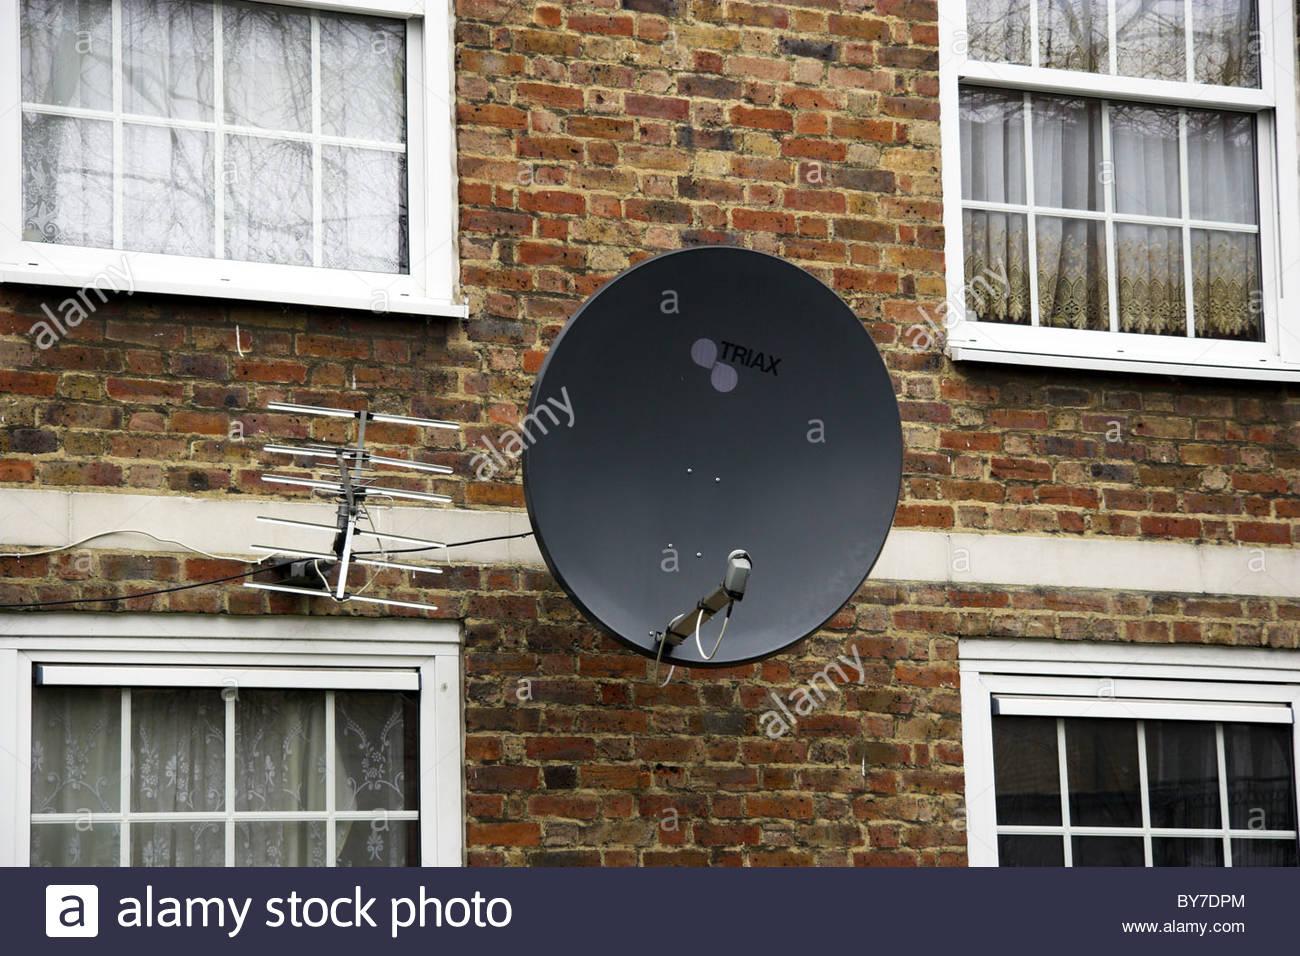 a26d2b0176e9 Tv Satellite Dish Stock Photos   Tv Satellite Dish Stock Images - Alamy